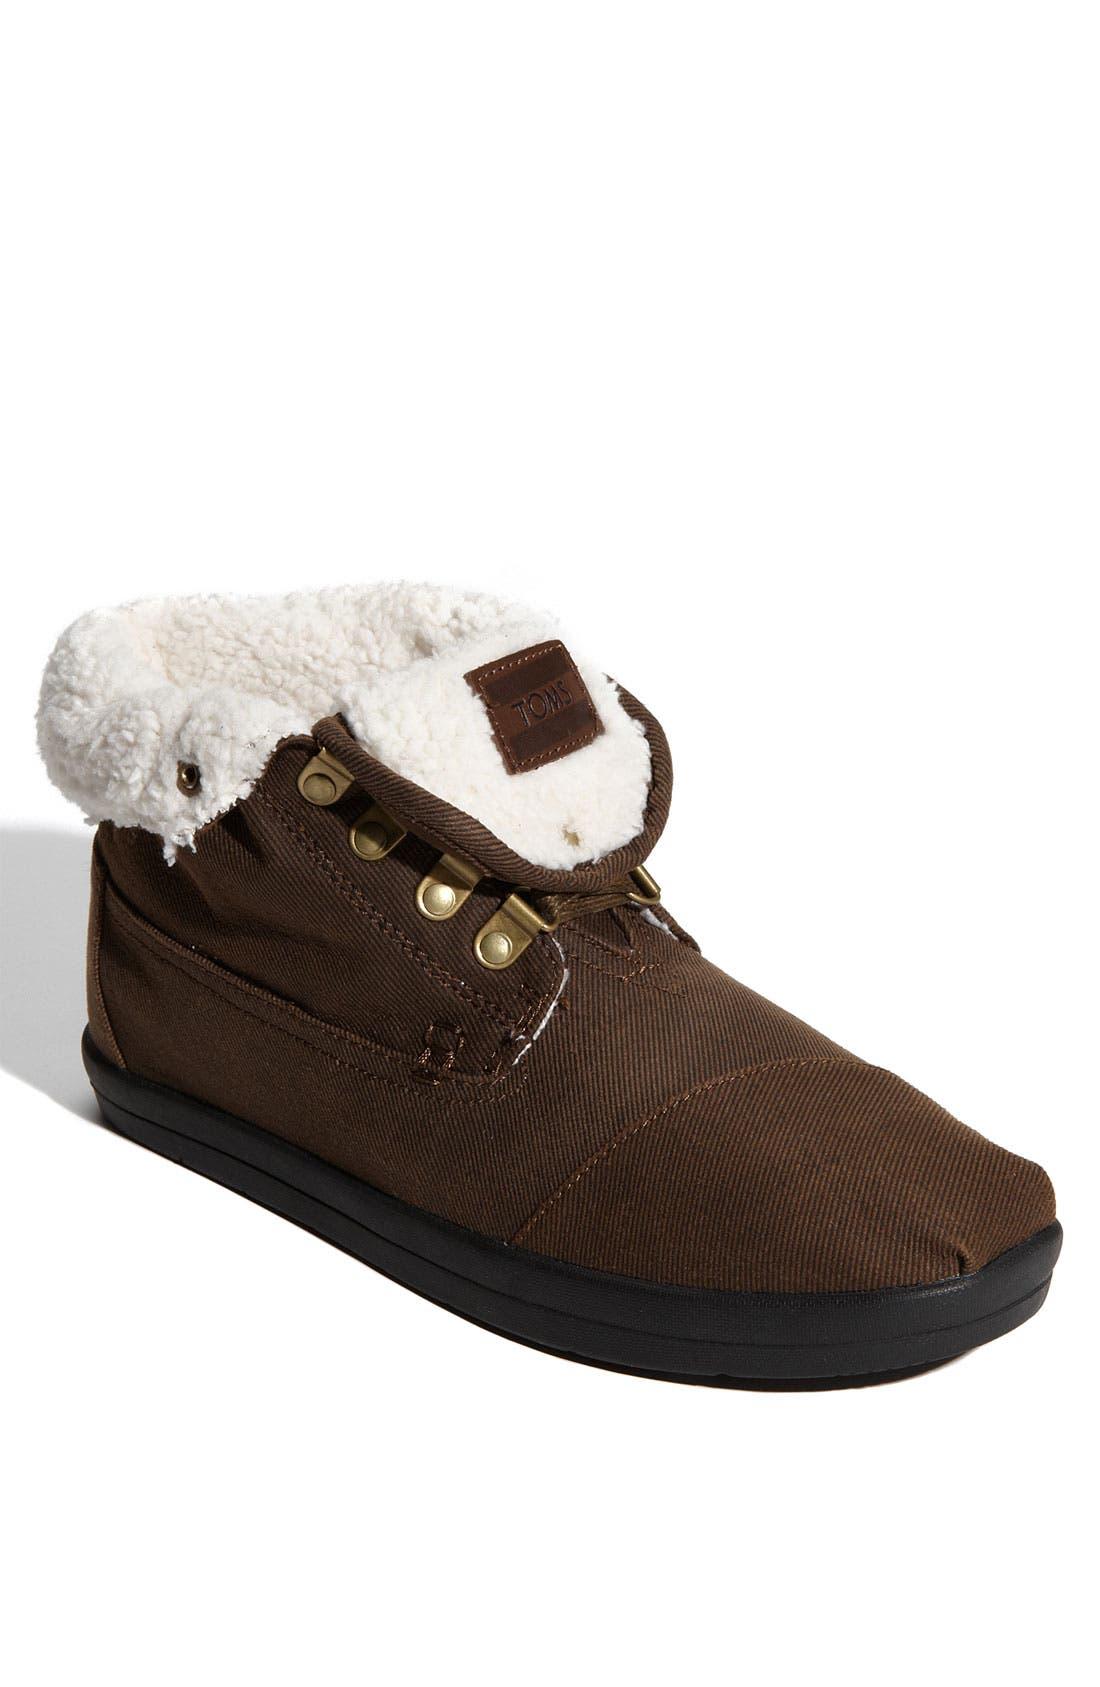 Alternate Image 1 Selected - TOMS 'Highlands' Fleece Boot (Men)